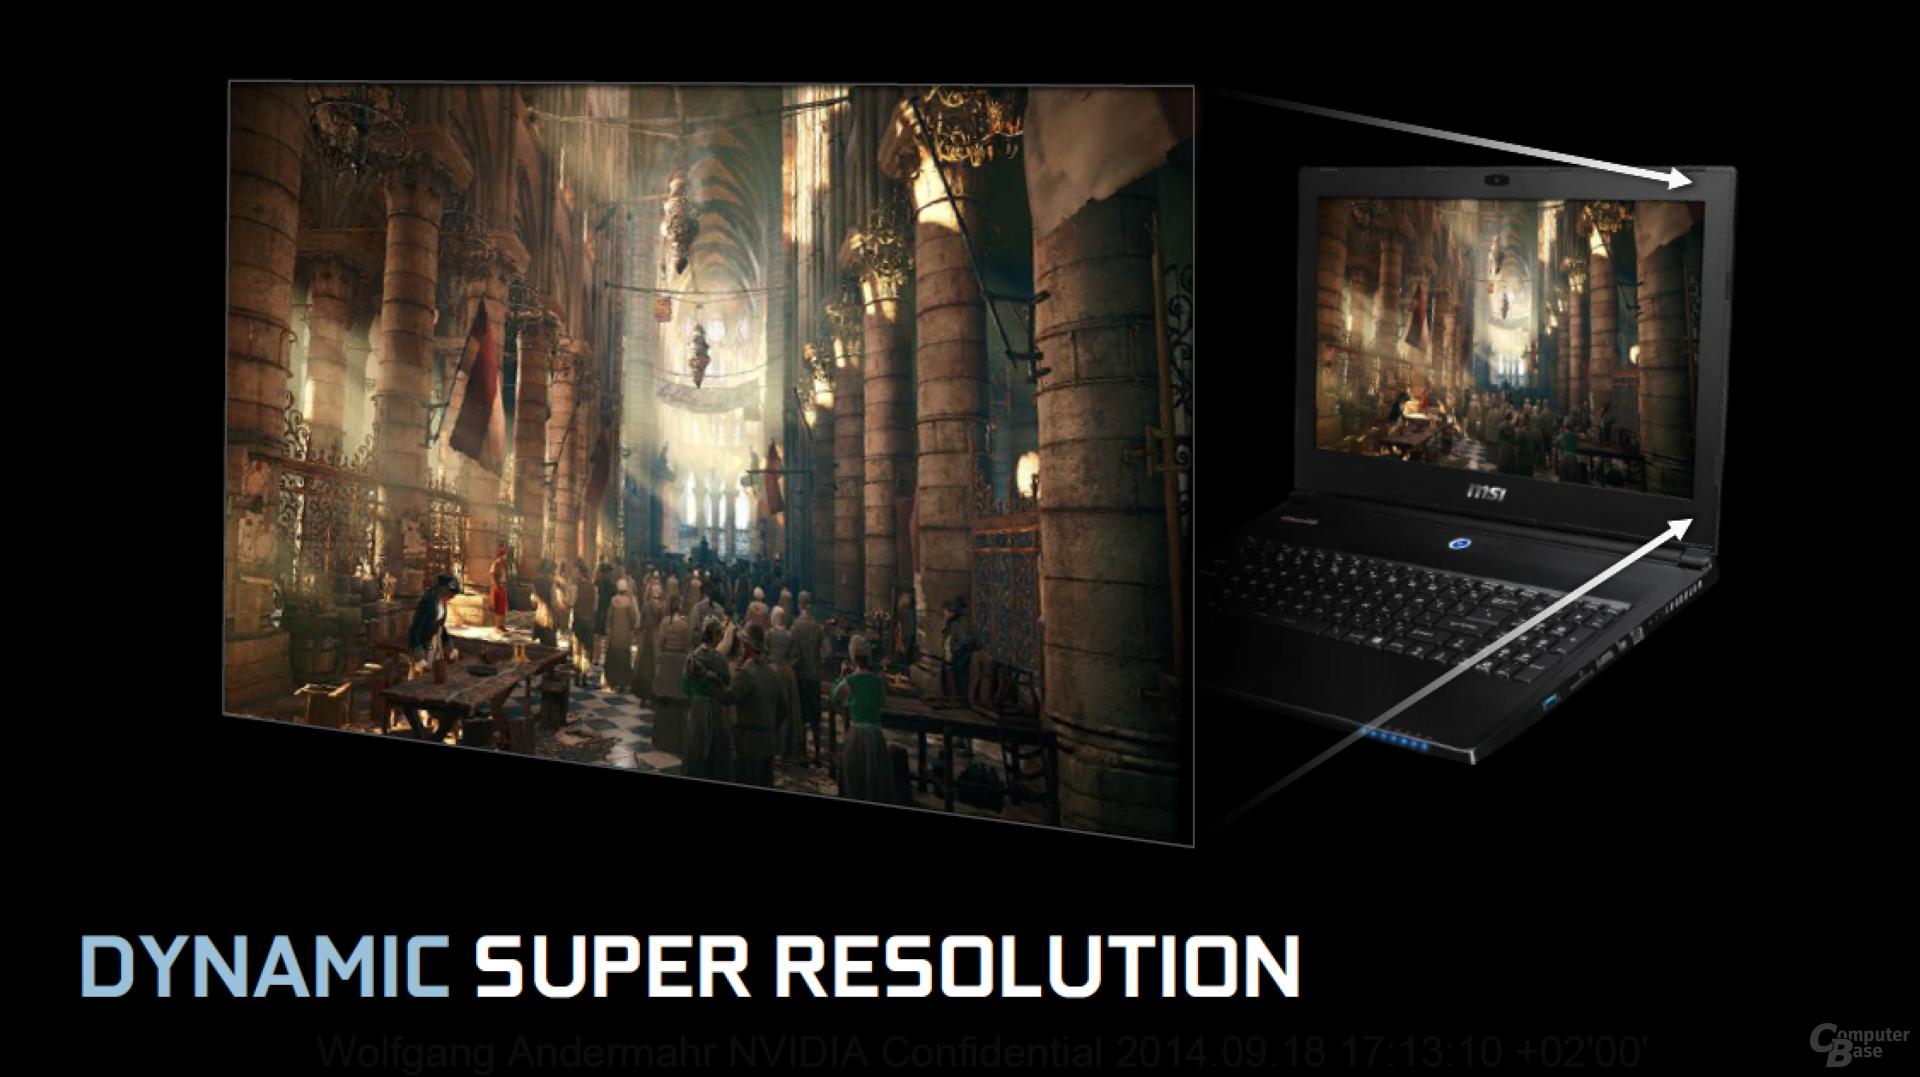 Dynamic Super Resolution (DSR)